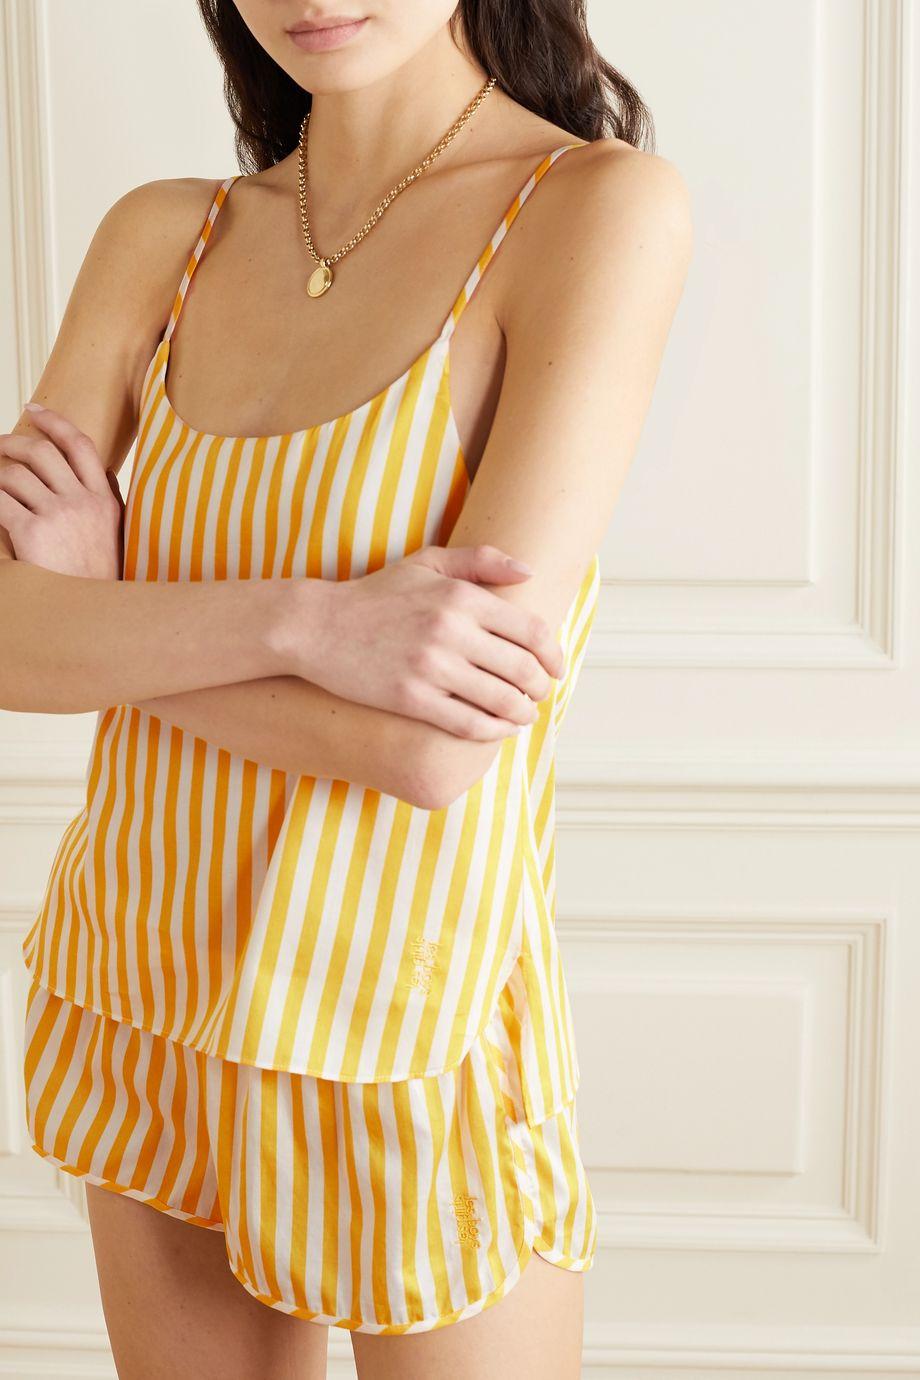 Les Girls Les Boys Striped cotton-sateen pajama set